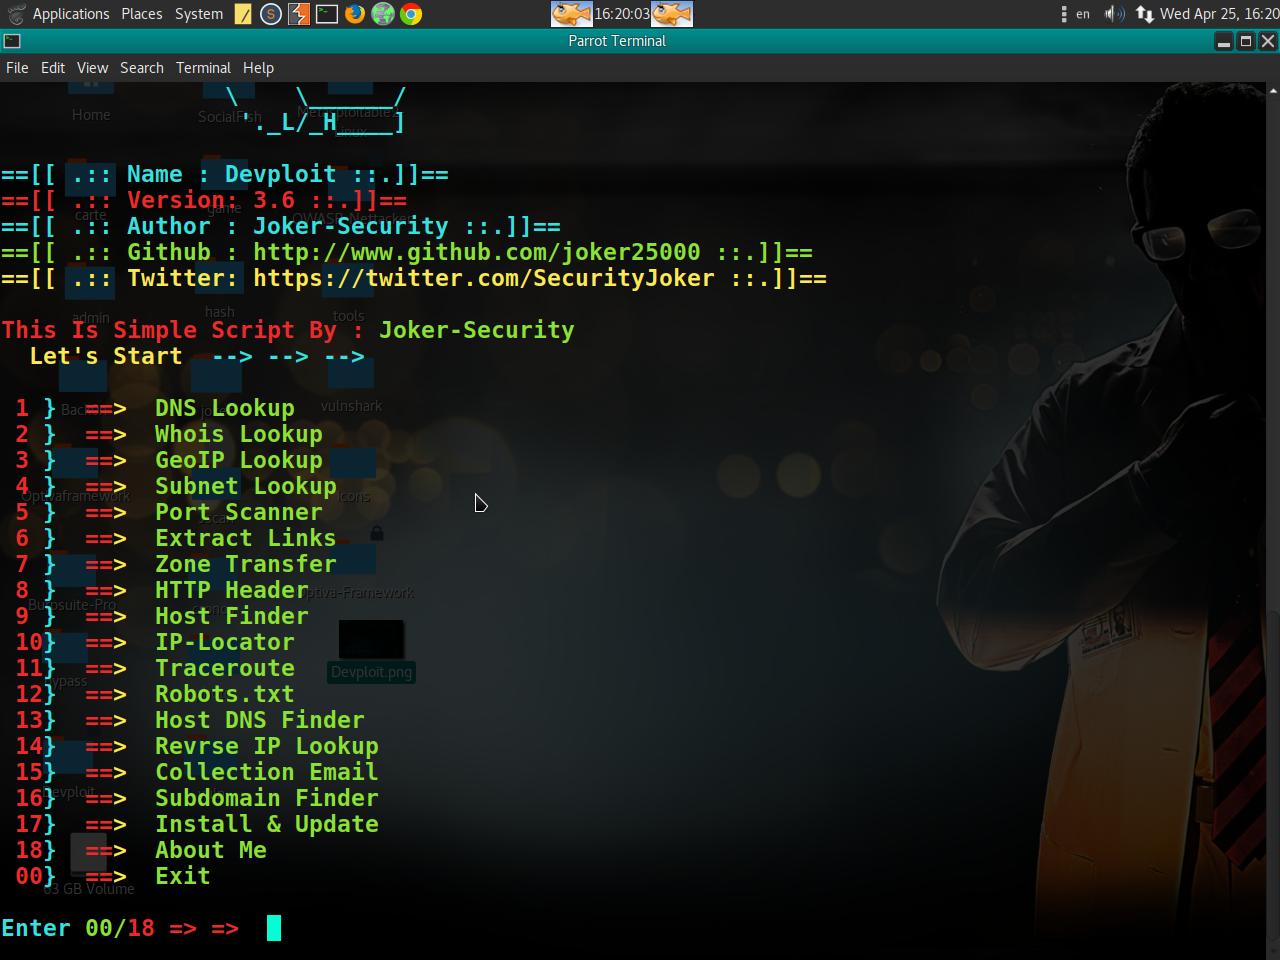 Devploit v3 6 - Information Gathering Tool